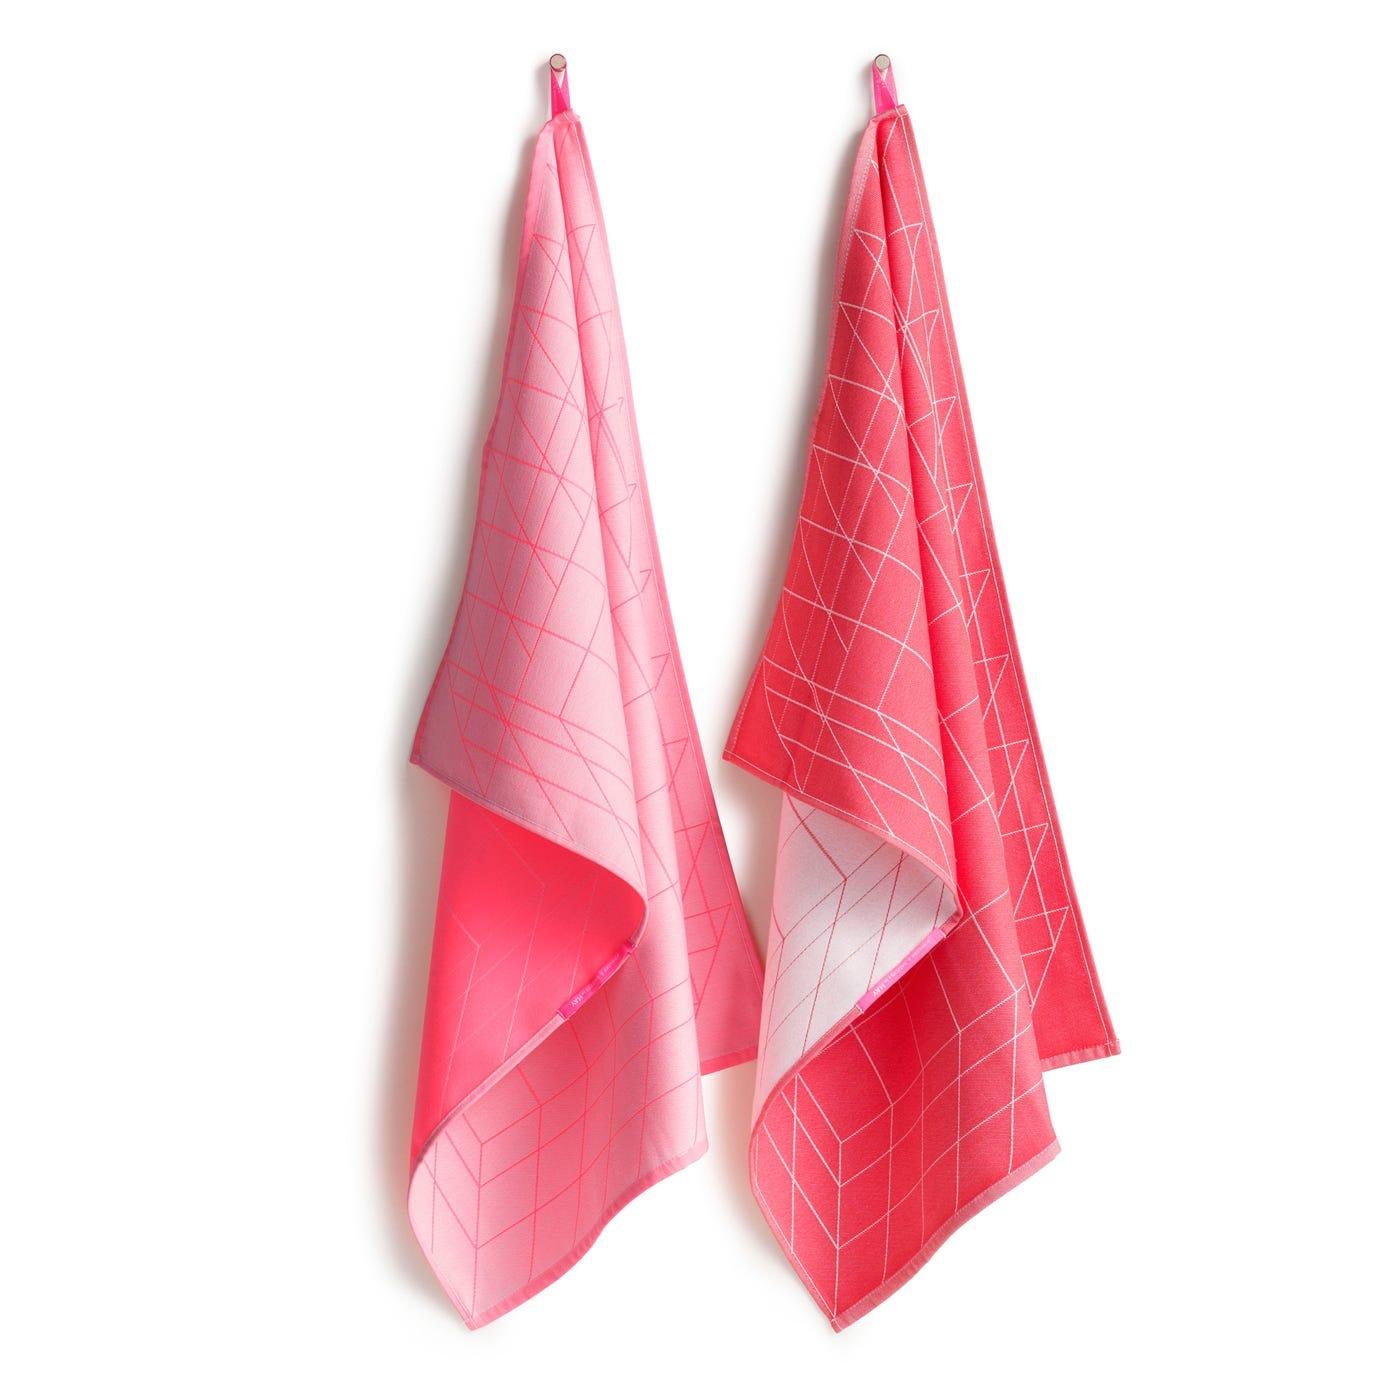 Scholten & Baijings Box Set of 2 Tea Towels